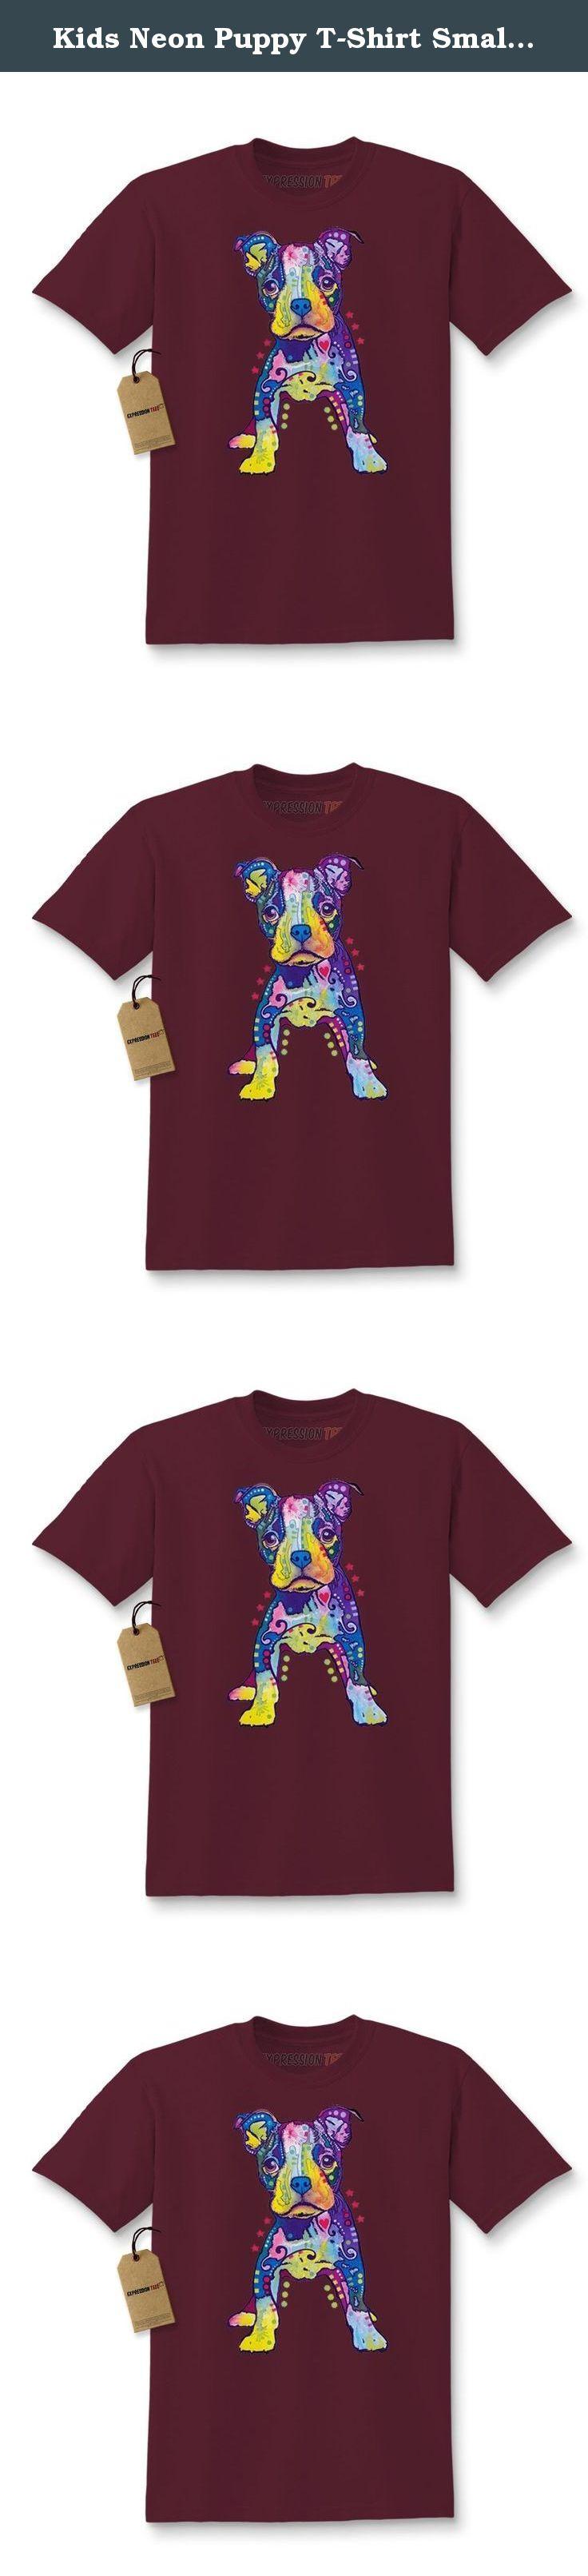 Black light t shirt ideas - Kids Neon Puppy T Shirt Small Maroon Our Neon Puppy Design Flouresces Under Blacklight